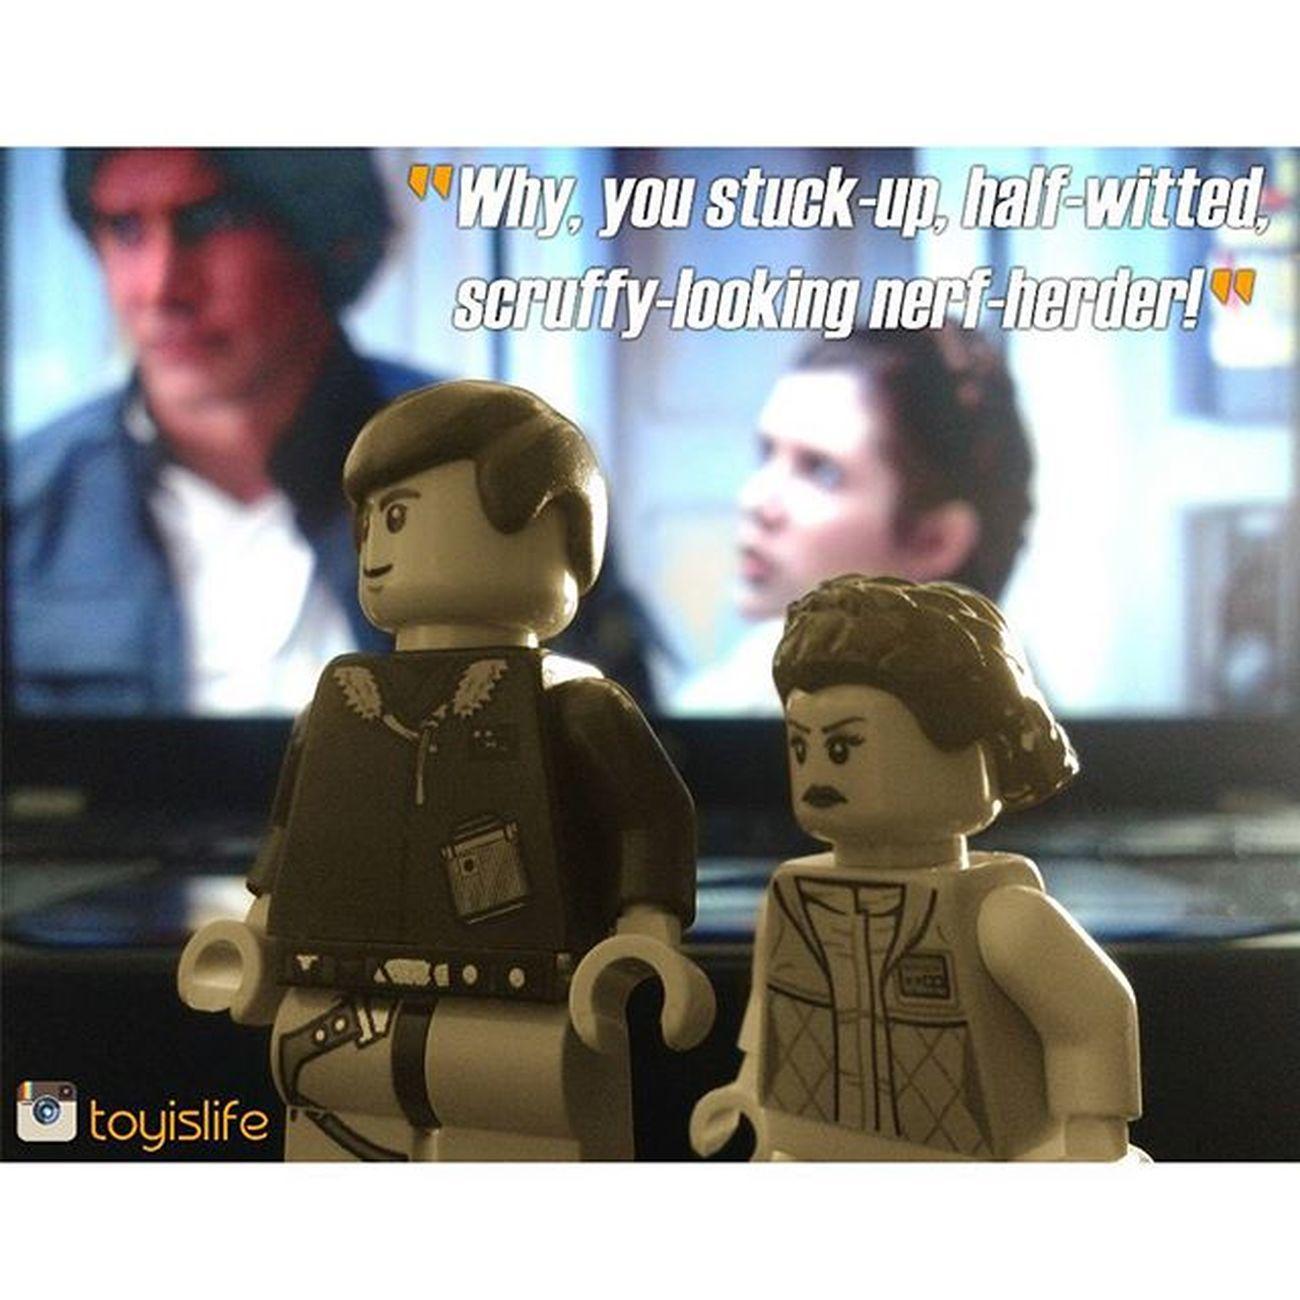 """Who's scruffy looking?"" Starwars Starwarstoys Legostagram LEGO Legolove Legofan Afol Han Solo Hansolo Leia Princess Leiaorgana Princessleia Rebels Smuggler Toyaddiction Love Lovehate Toyfun Sillythings Toyographer Toyography Legophoto Legophotography vitruvianbrix brickvision"